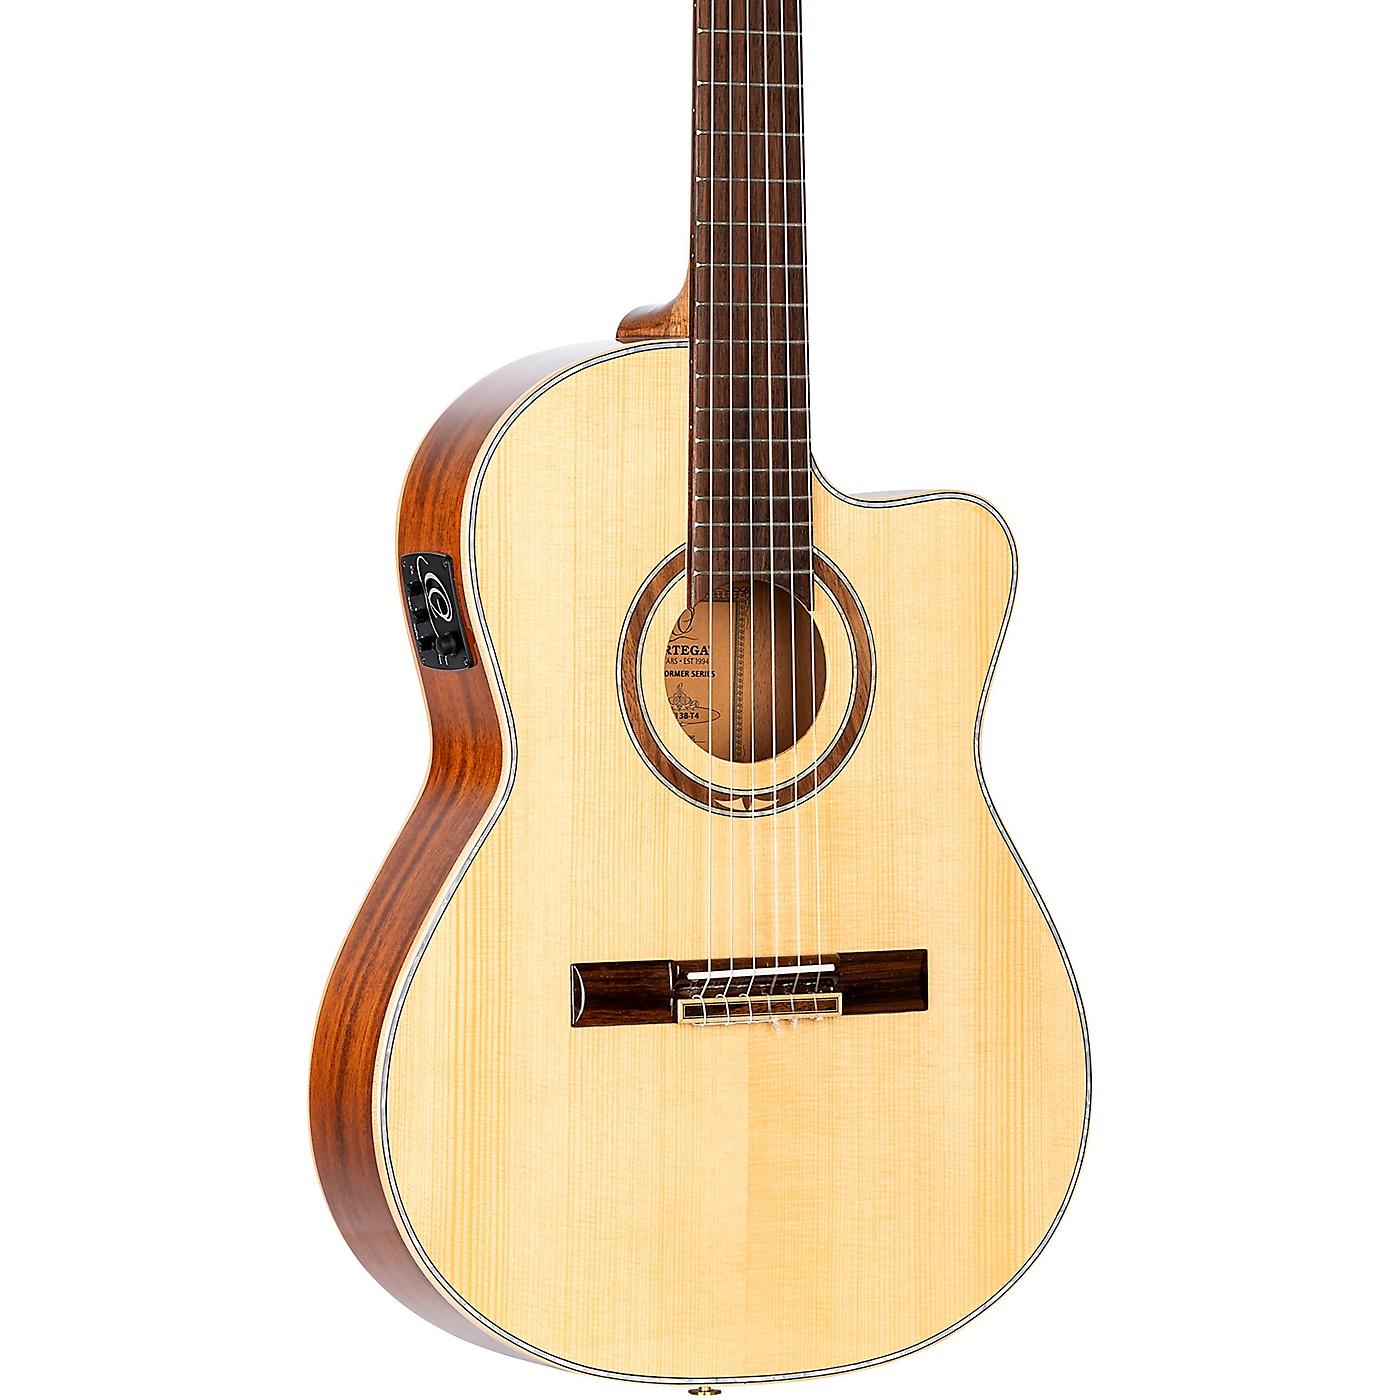 Ortega RCE138-T4 Thinline Acoustic-Electric Nylon Guitar thumbnail